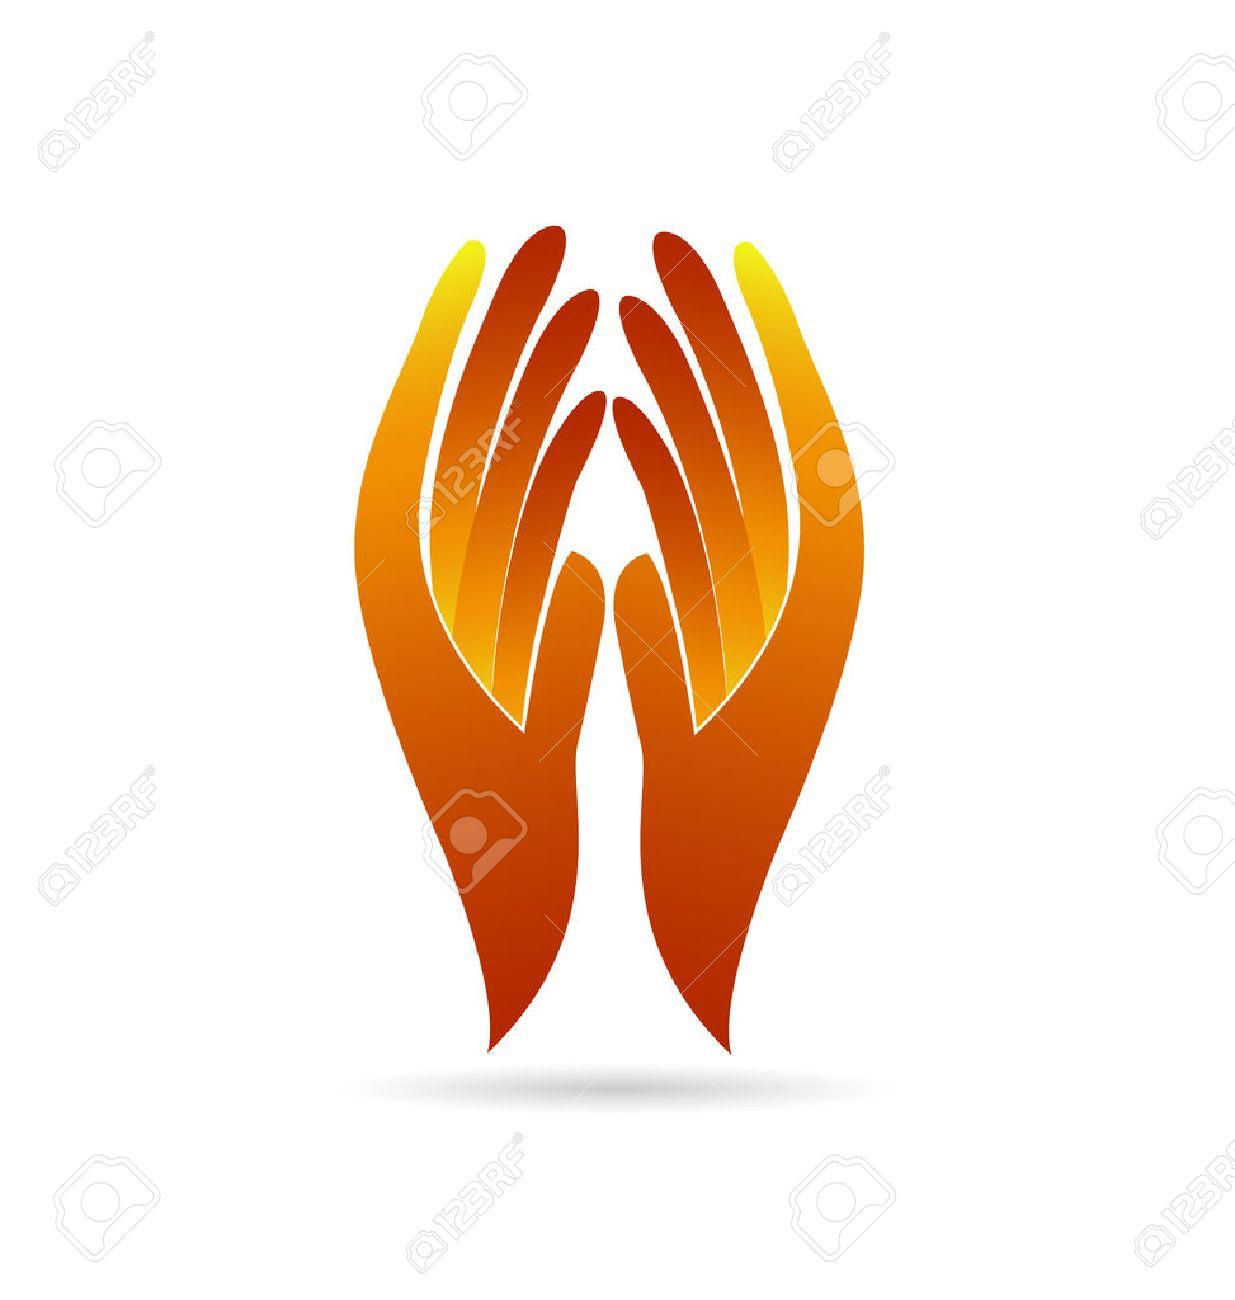 Hopeless hands faith concept identity business card vector icon faith concept identity business card vector icon logo imagens 40132718 reheart Images